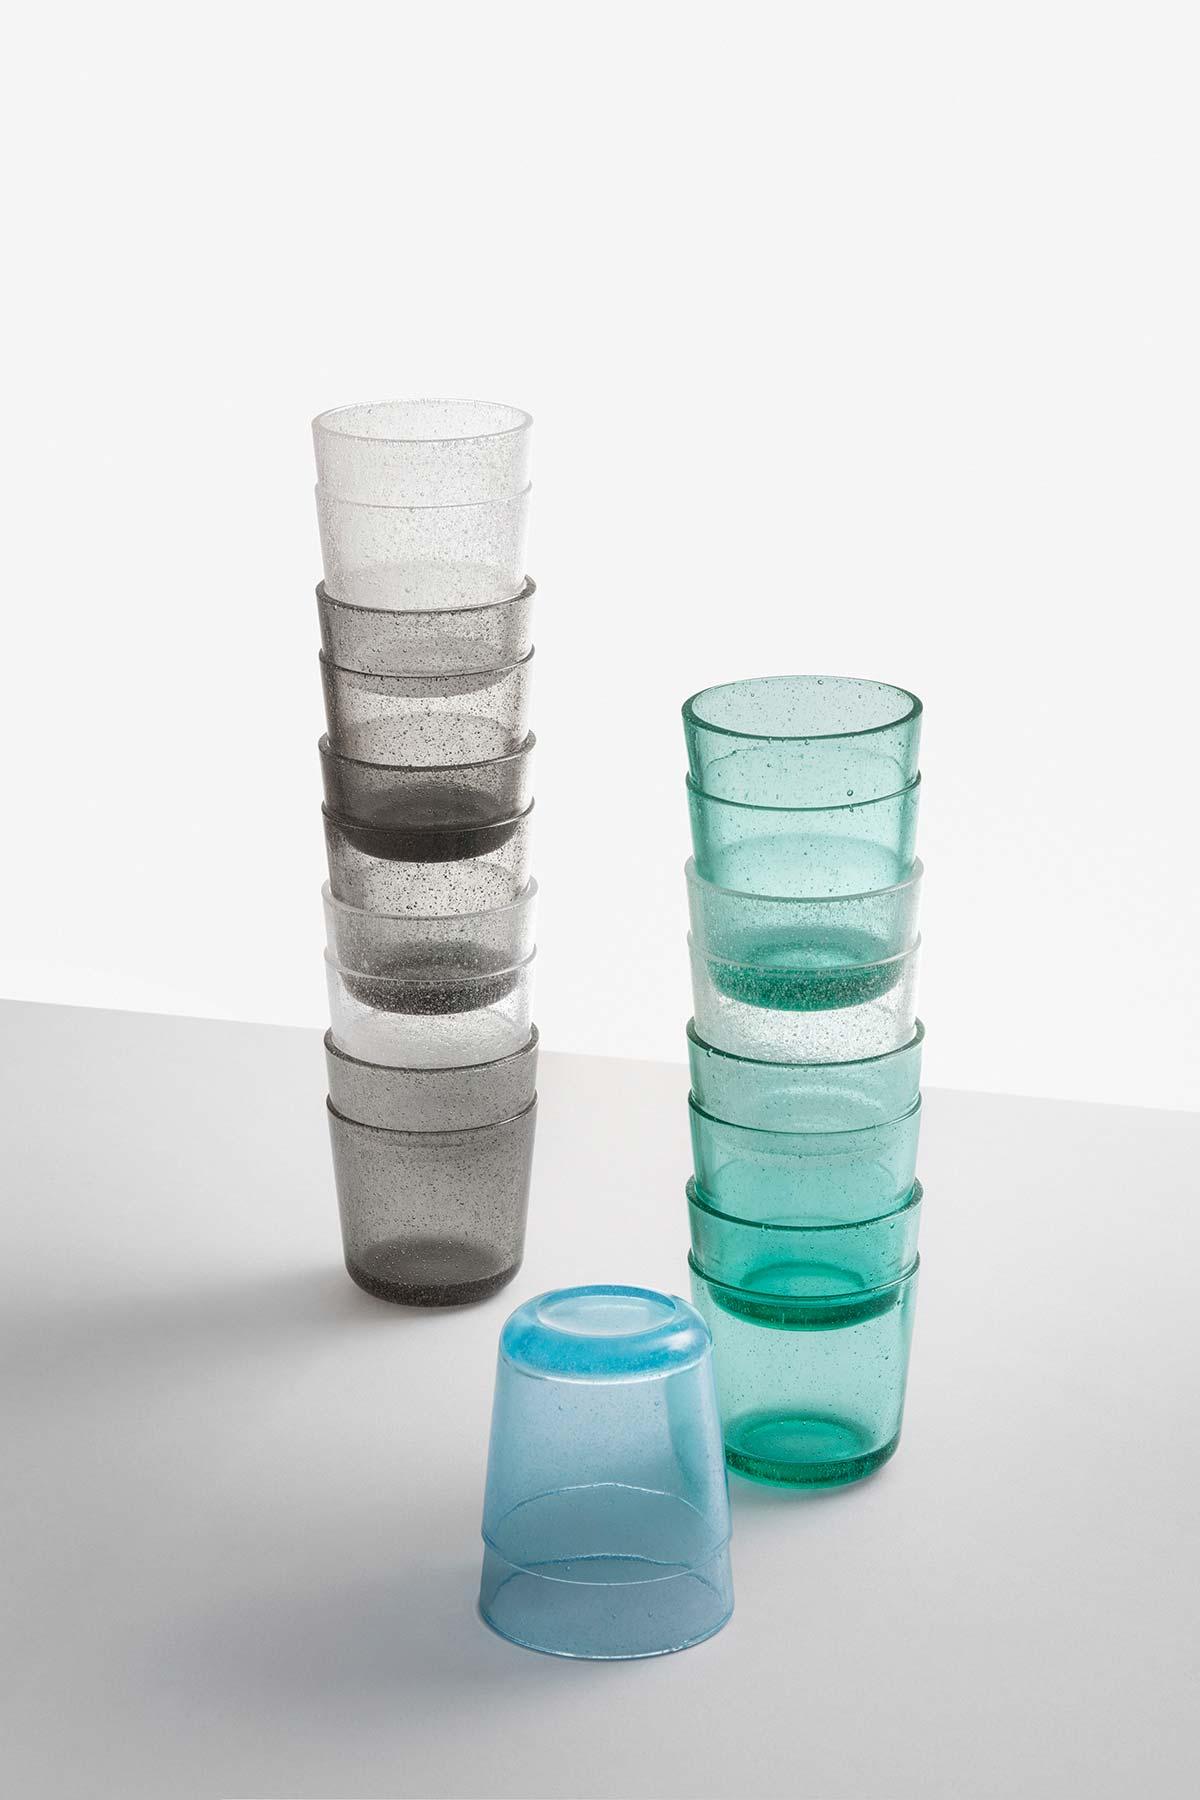 Gap by Ichendorf - Design Studio Klass - Photo © Aberto Strada